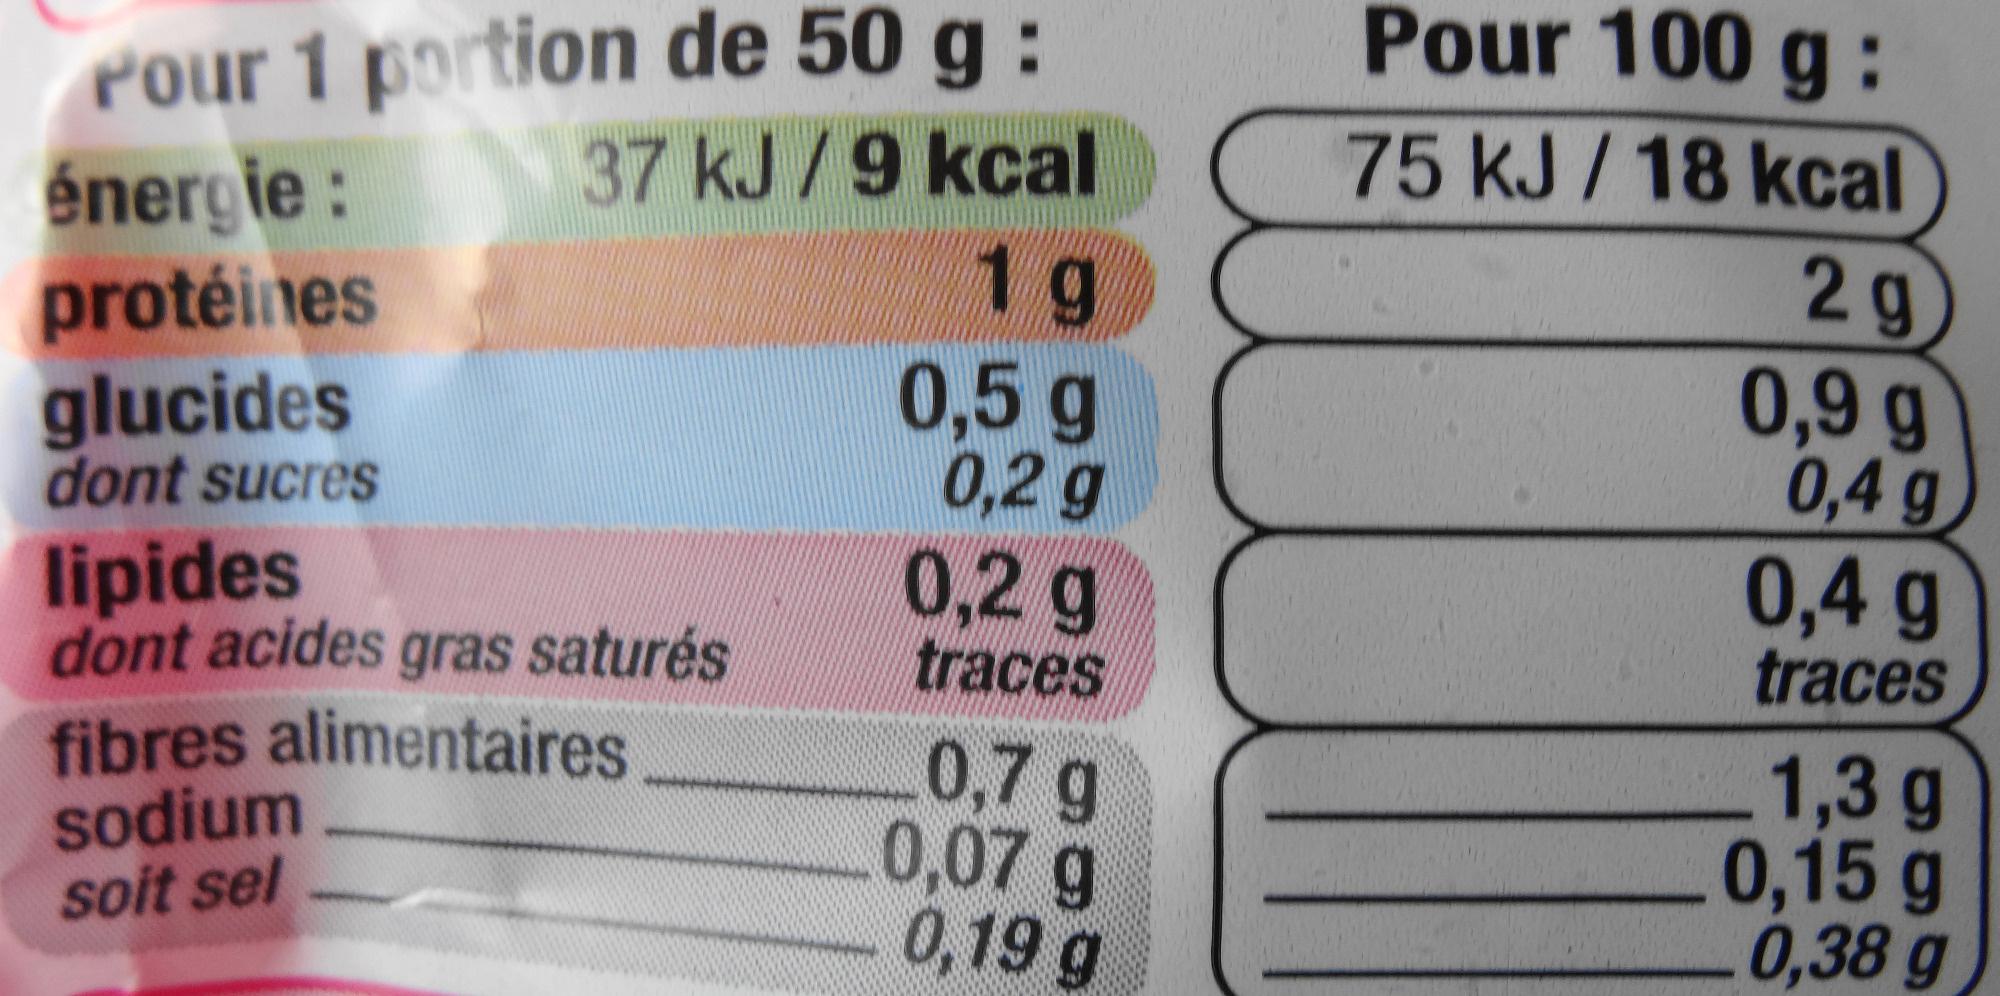 P'tites pousses - Voedingswaarden